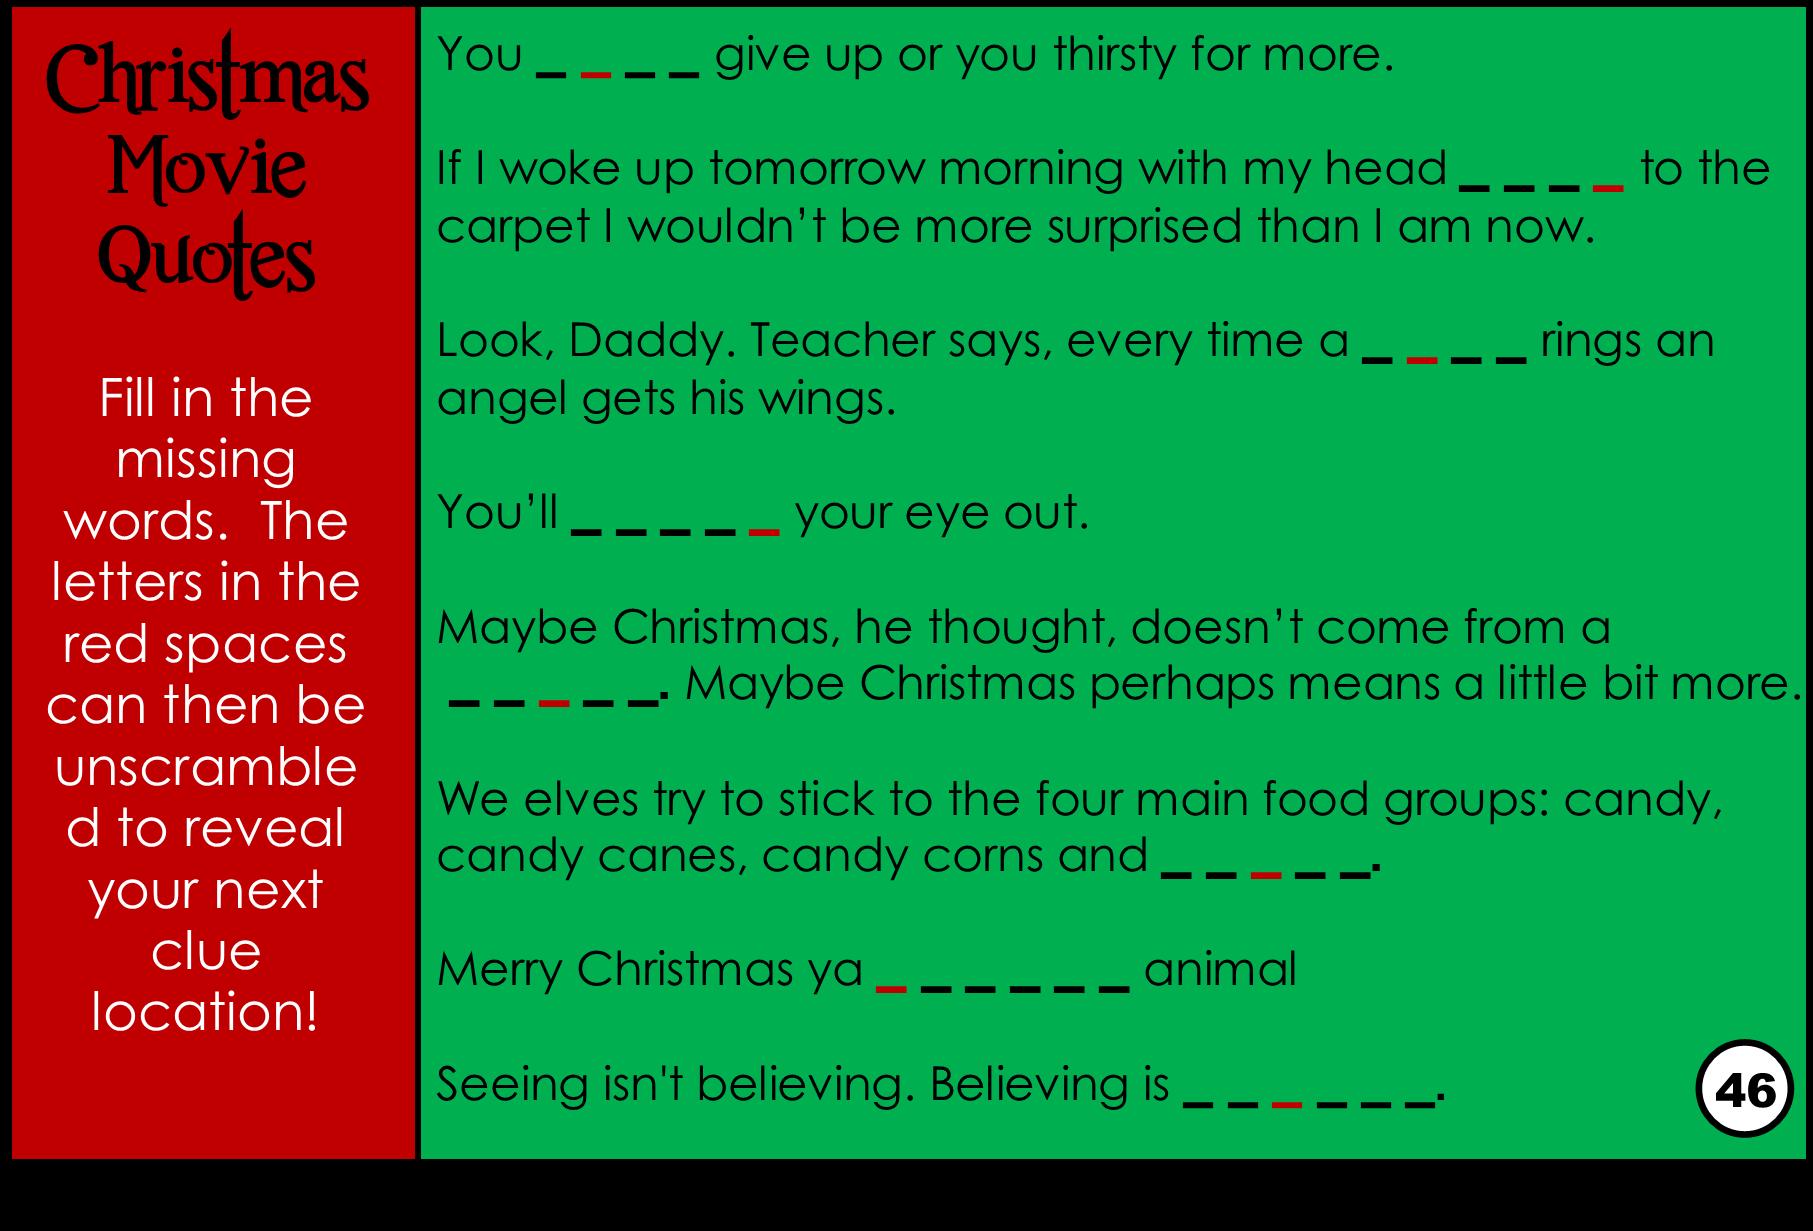 Free Christmas Printables With Favorite Movie Quotes: Printable Christmas Movie Trivia Game Treasure Hunt